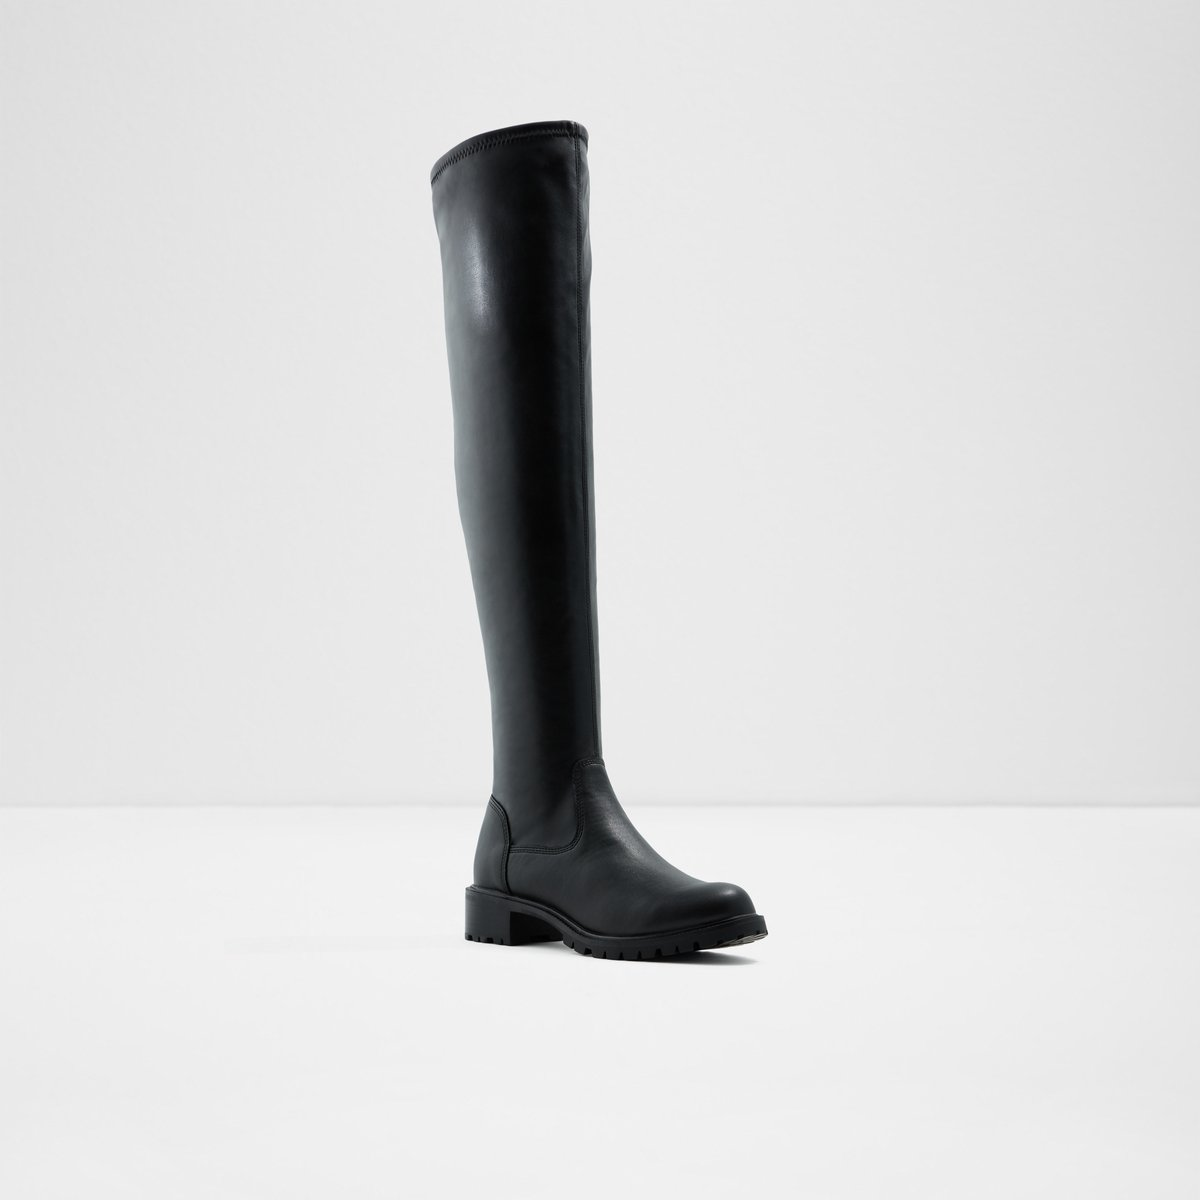 9fb2d37337c Laruria Black Women s Over-the-knee boots